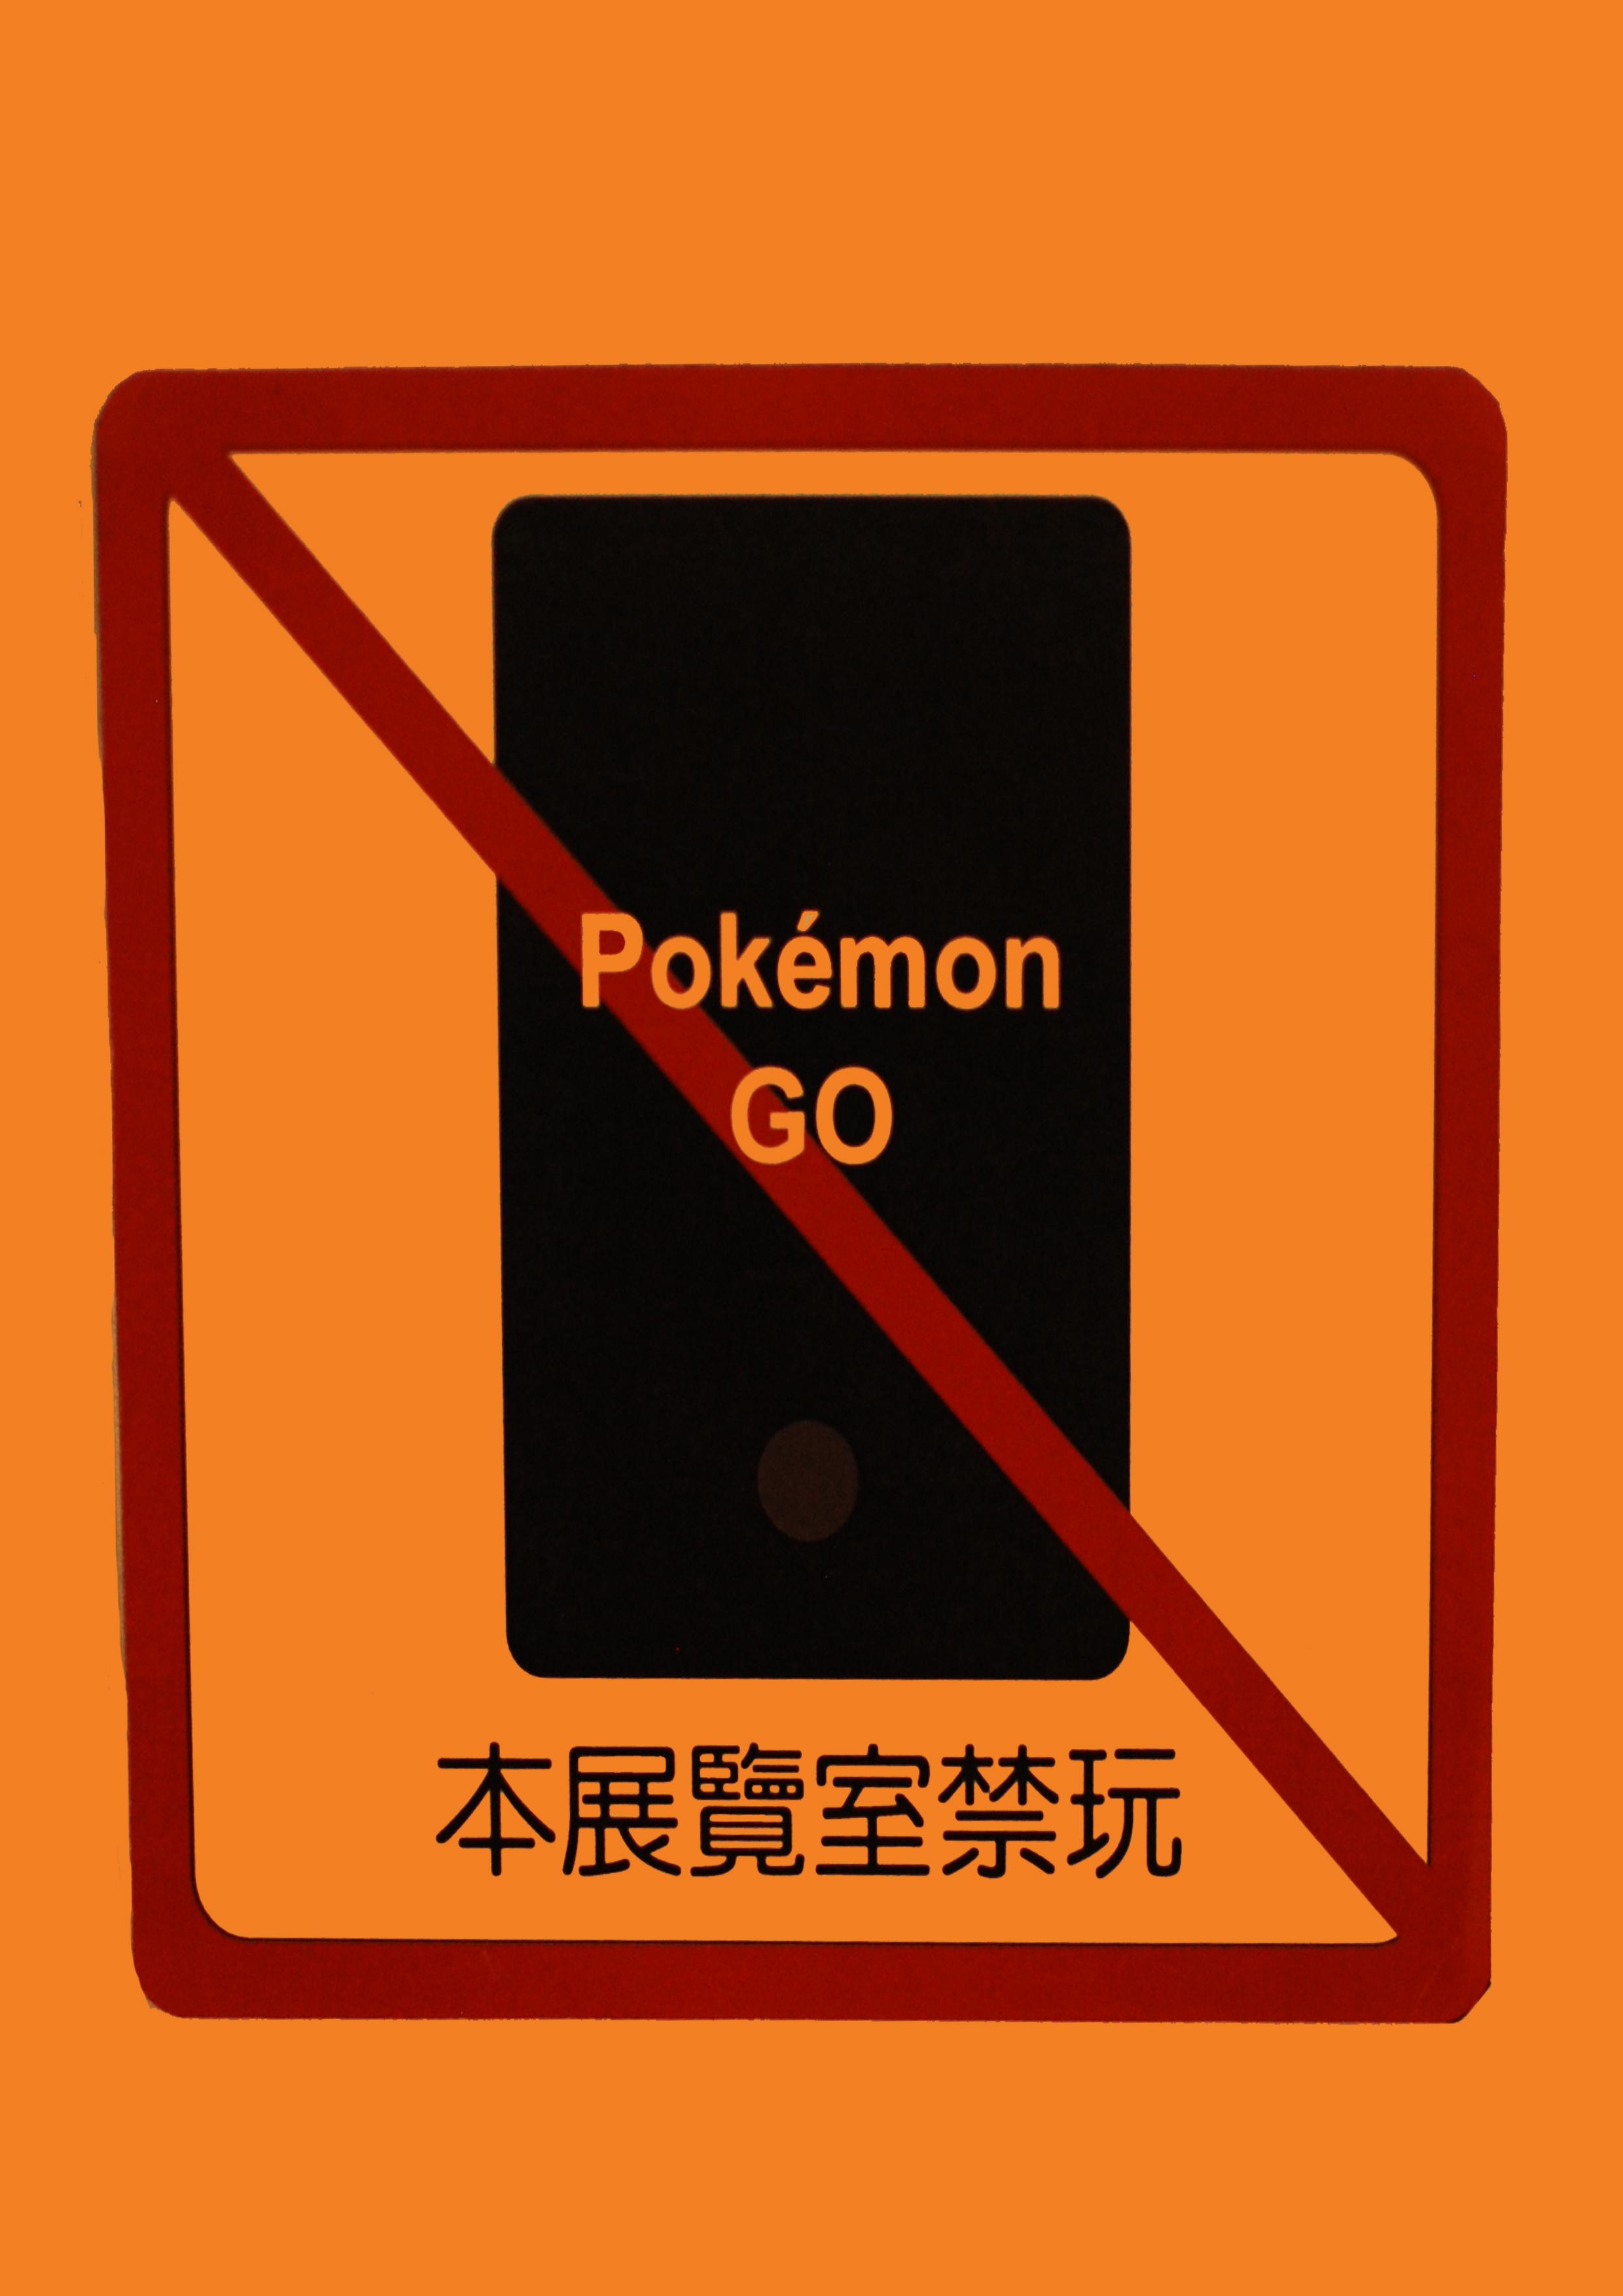 pokemon_go_orange